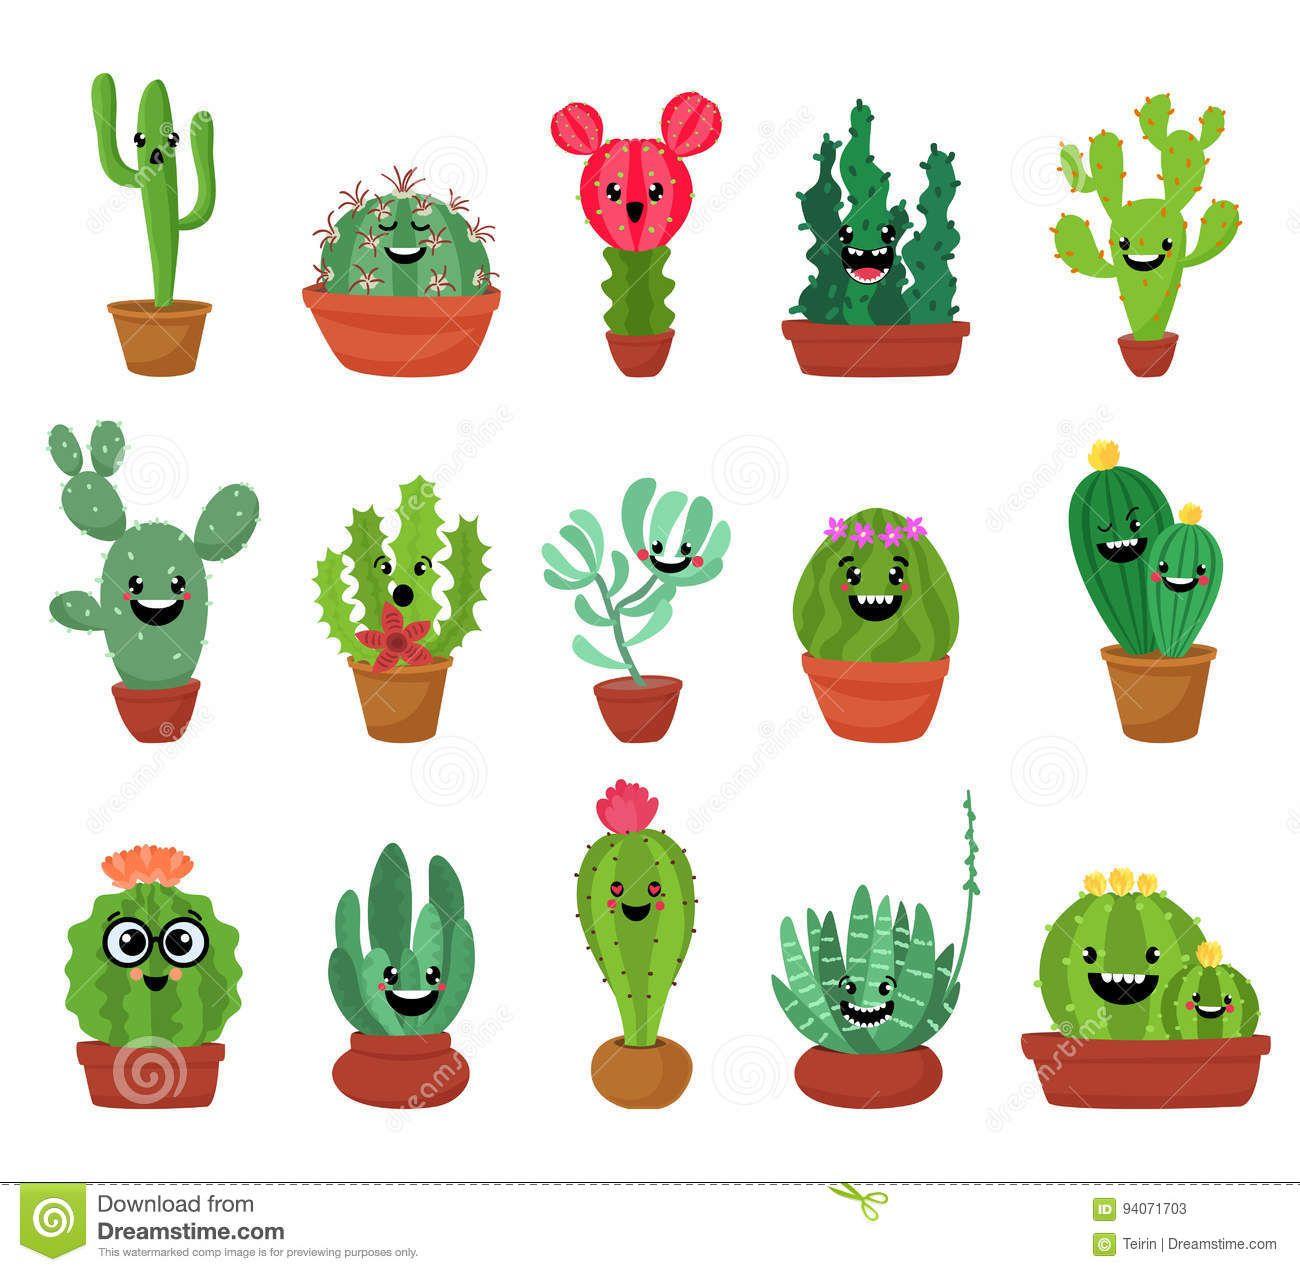 Cactus clipart face. Big set of cute